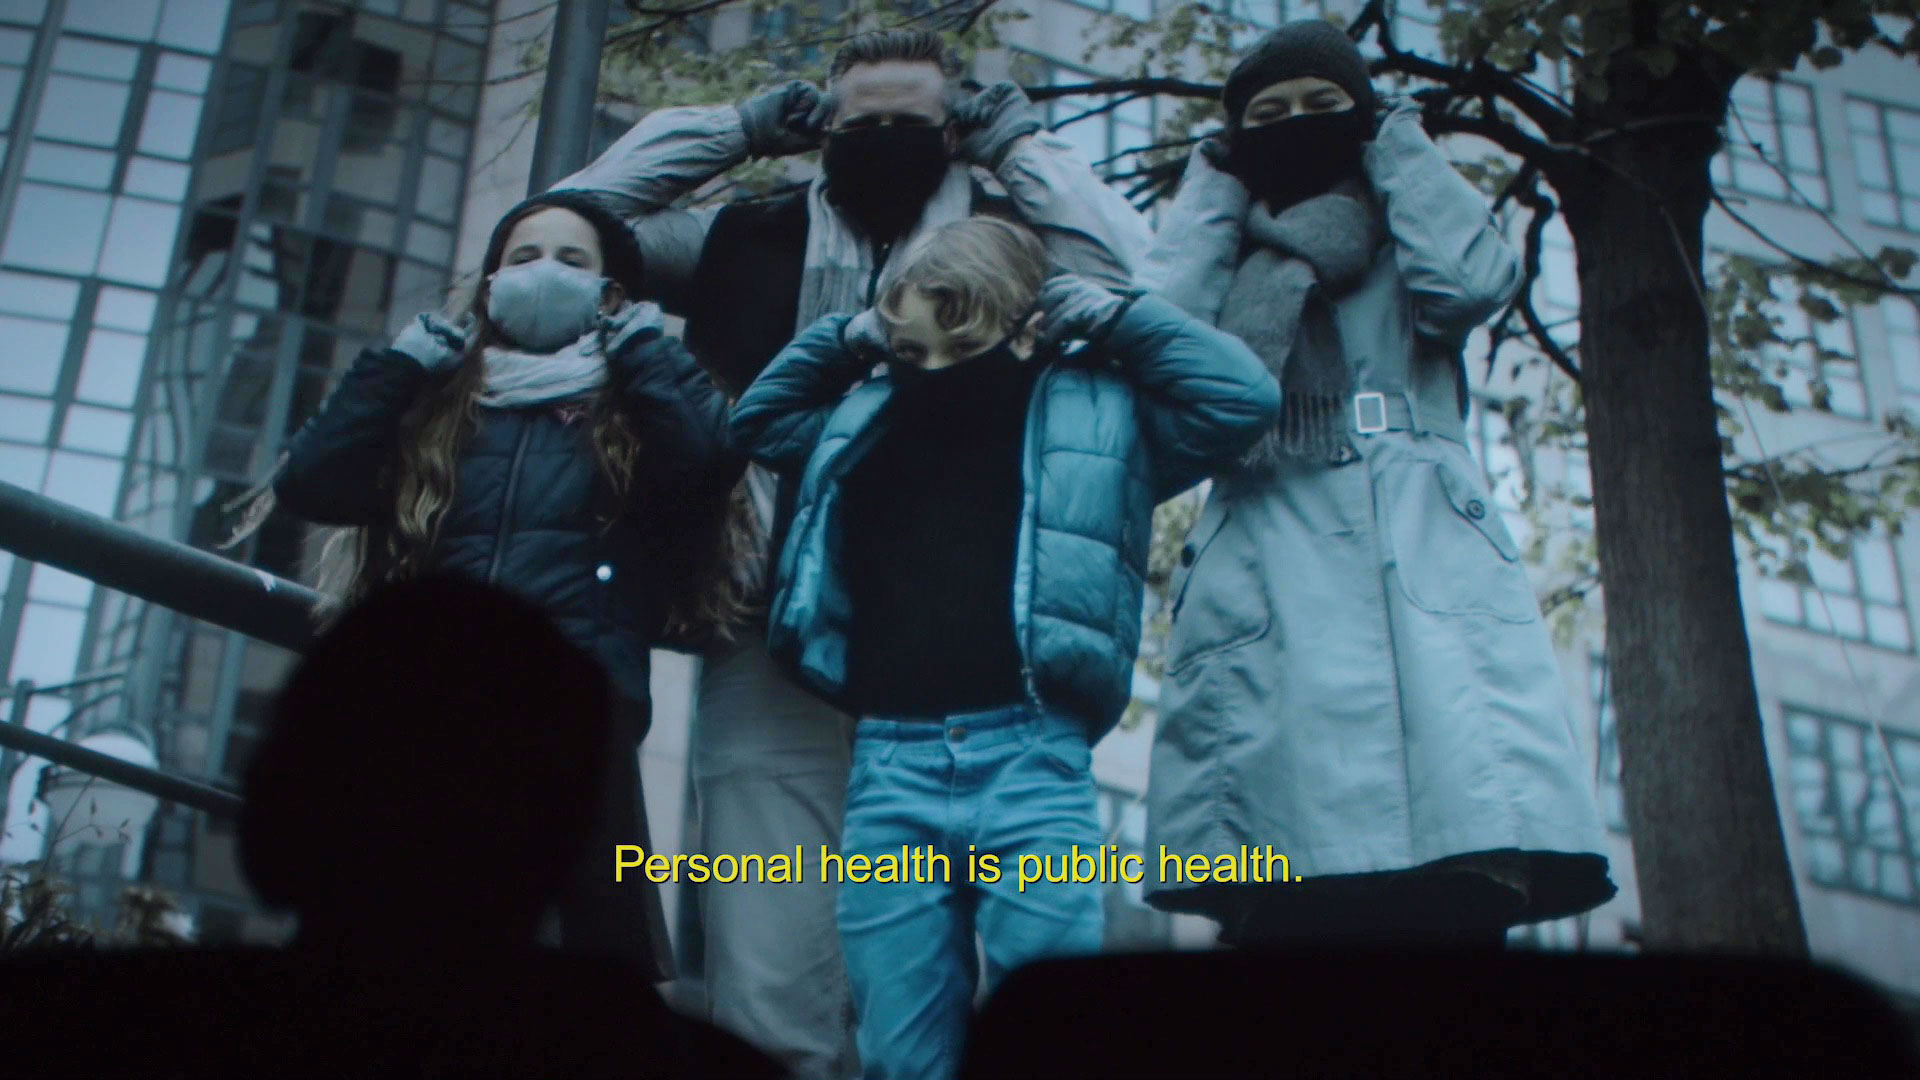 D2-Health-PSA-Counterpart-STARZ-Season-1-Episode-3-The-Lost-Art-of-Diplomacy.jpg